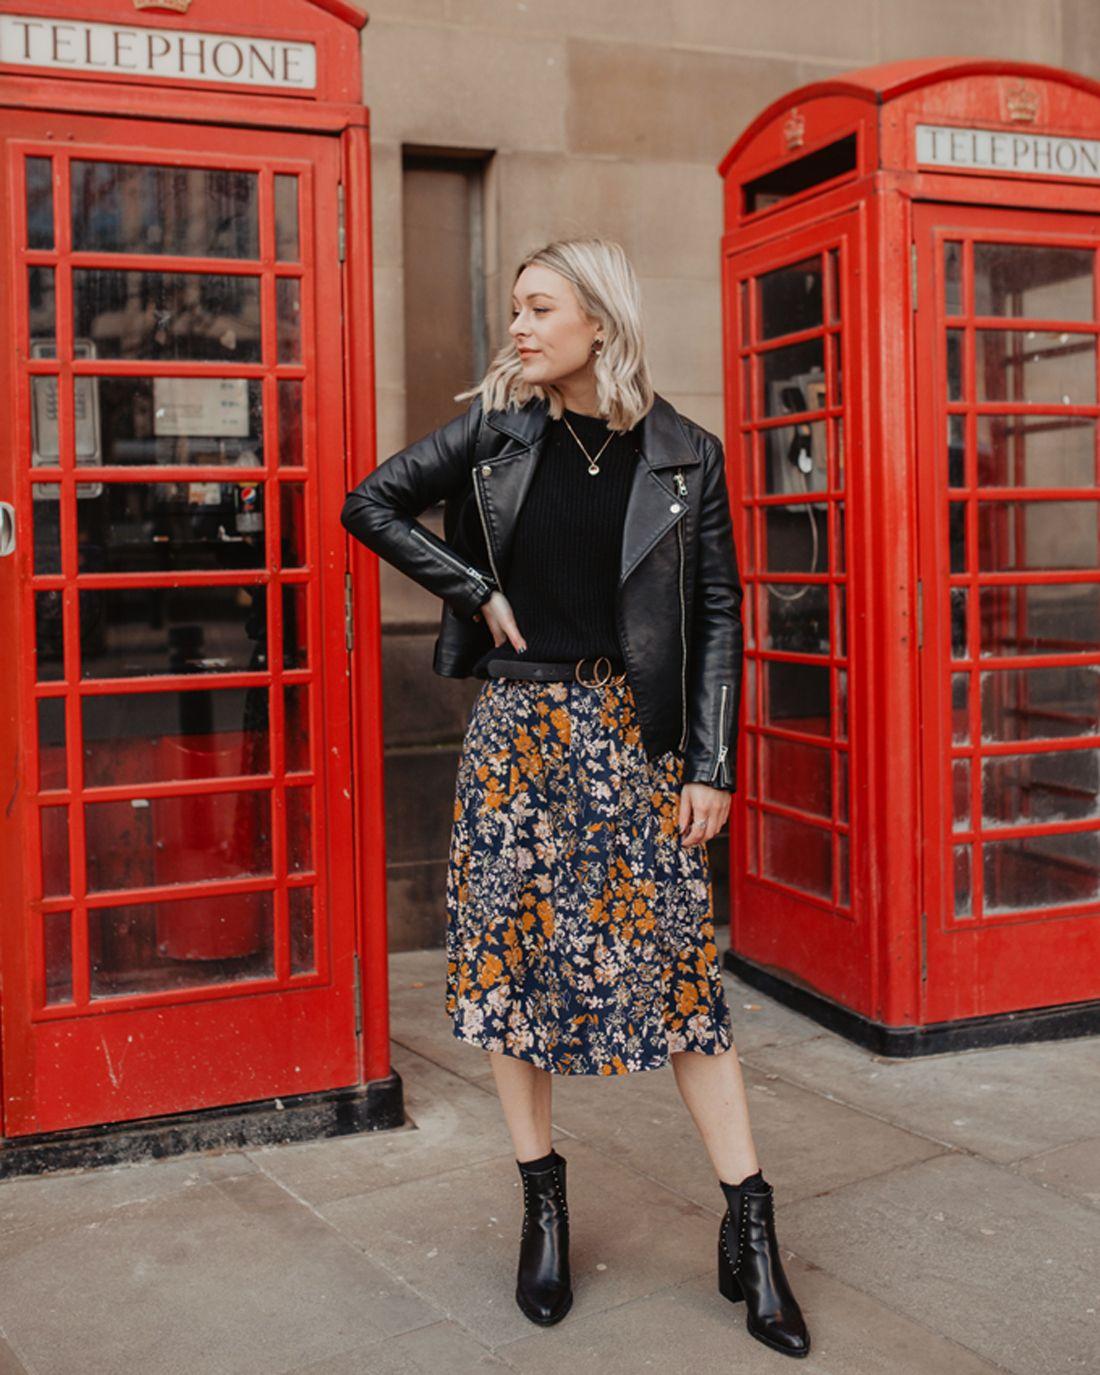 Buy Less: Wardrobe Staples Worth Investing In 2